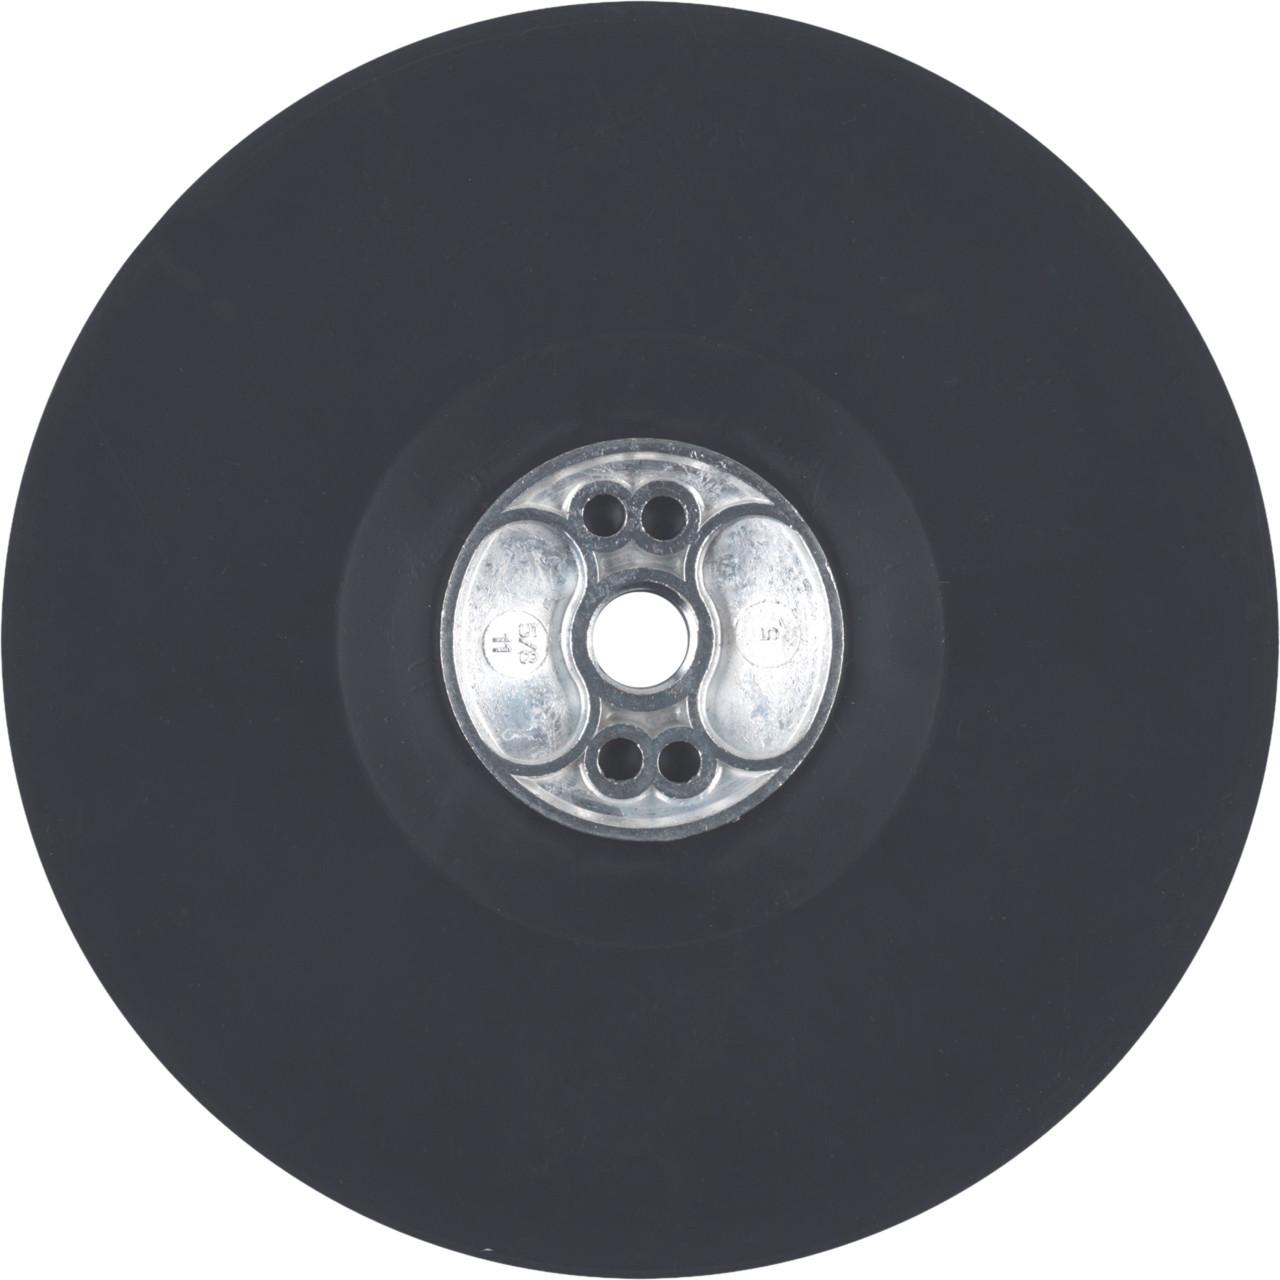 Immagine di Accessorio BASIC* per dischi in fibra